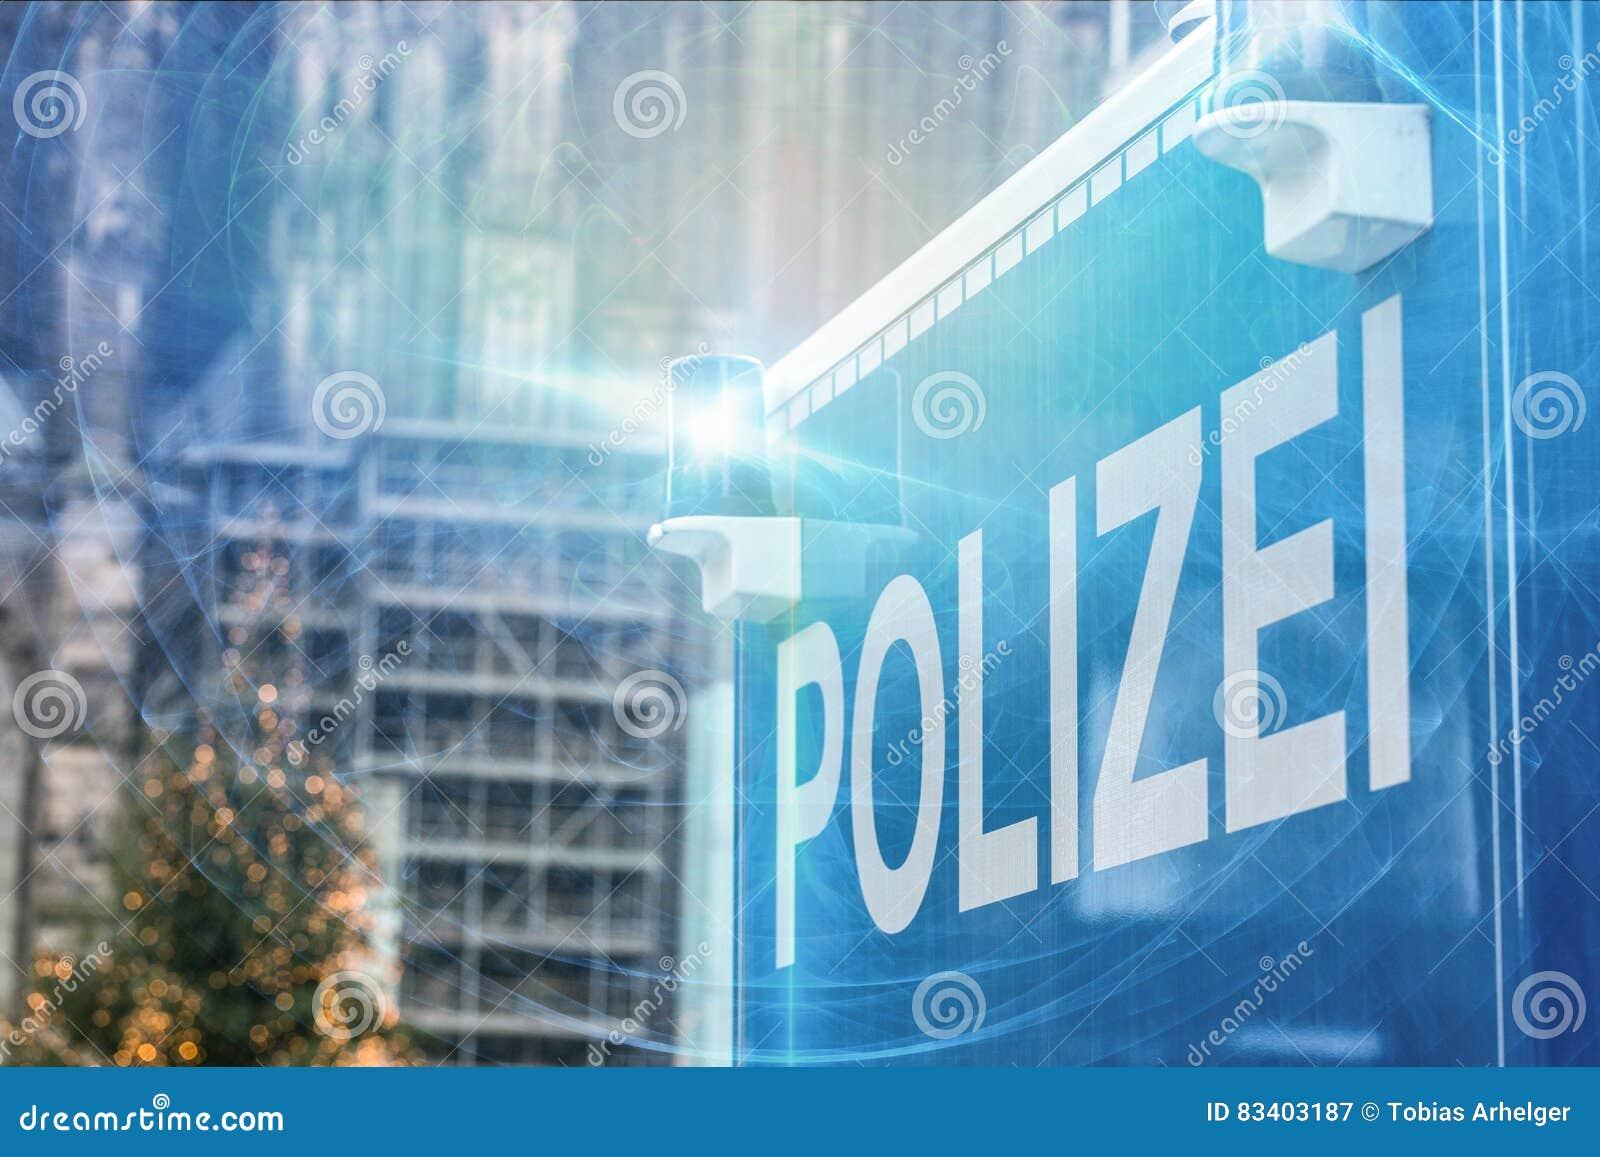 German police sign blue warning light